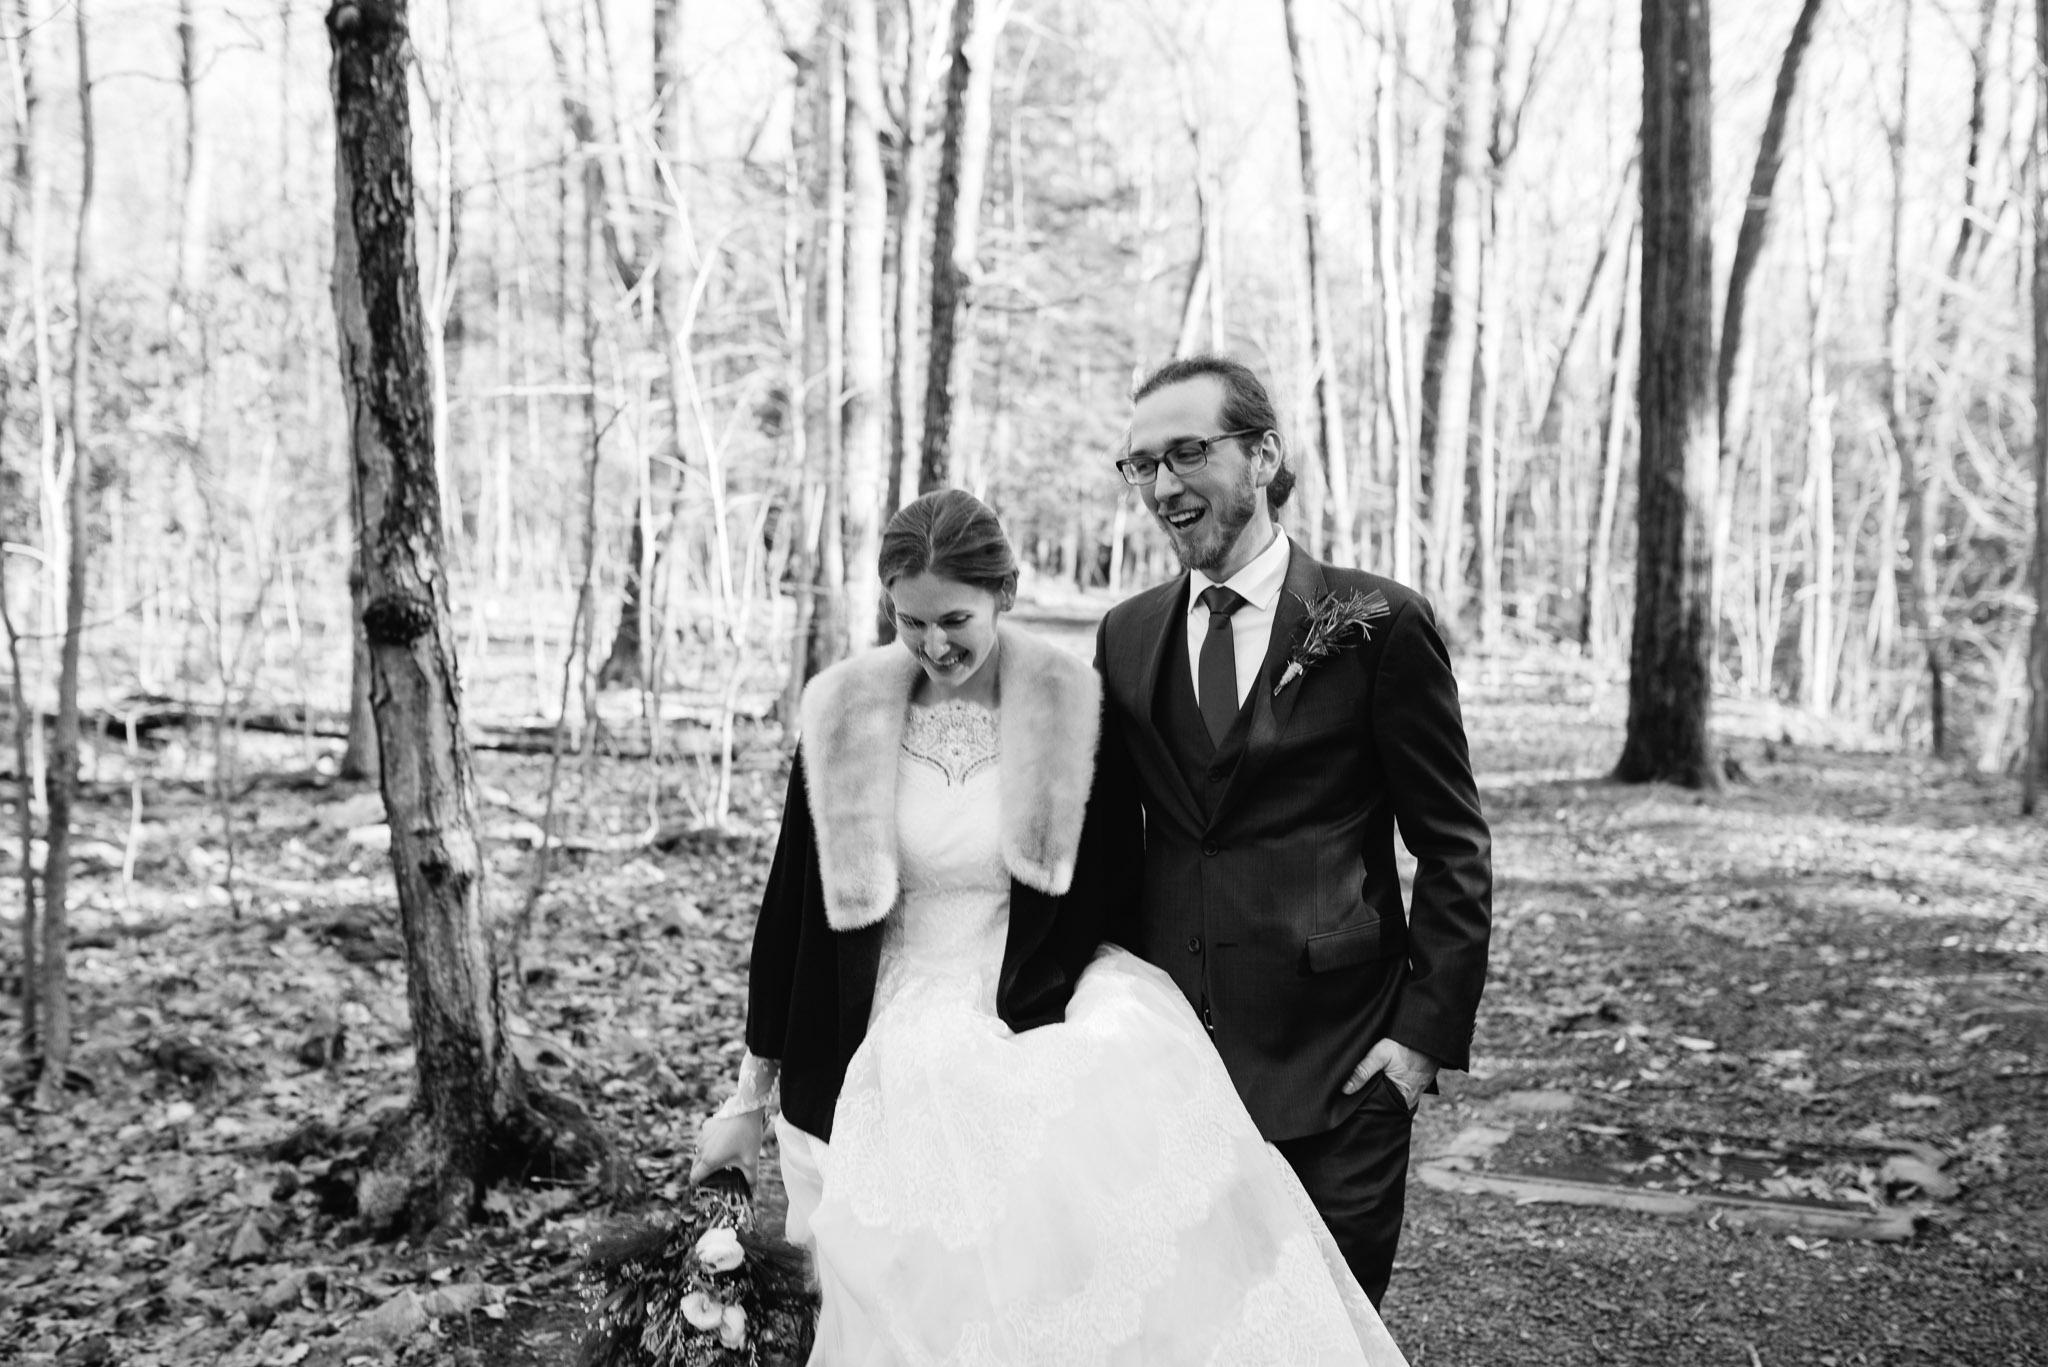 Wedding Couples portrait, Ligonier Wedding Photographer, Ligonier PA wedding, wedding potraits-6792.jpg